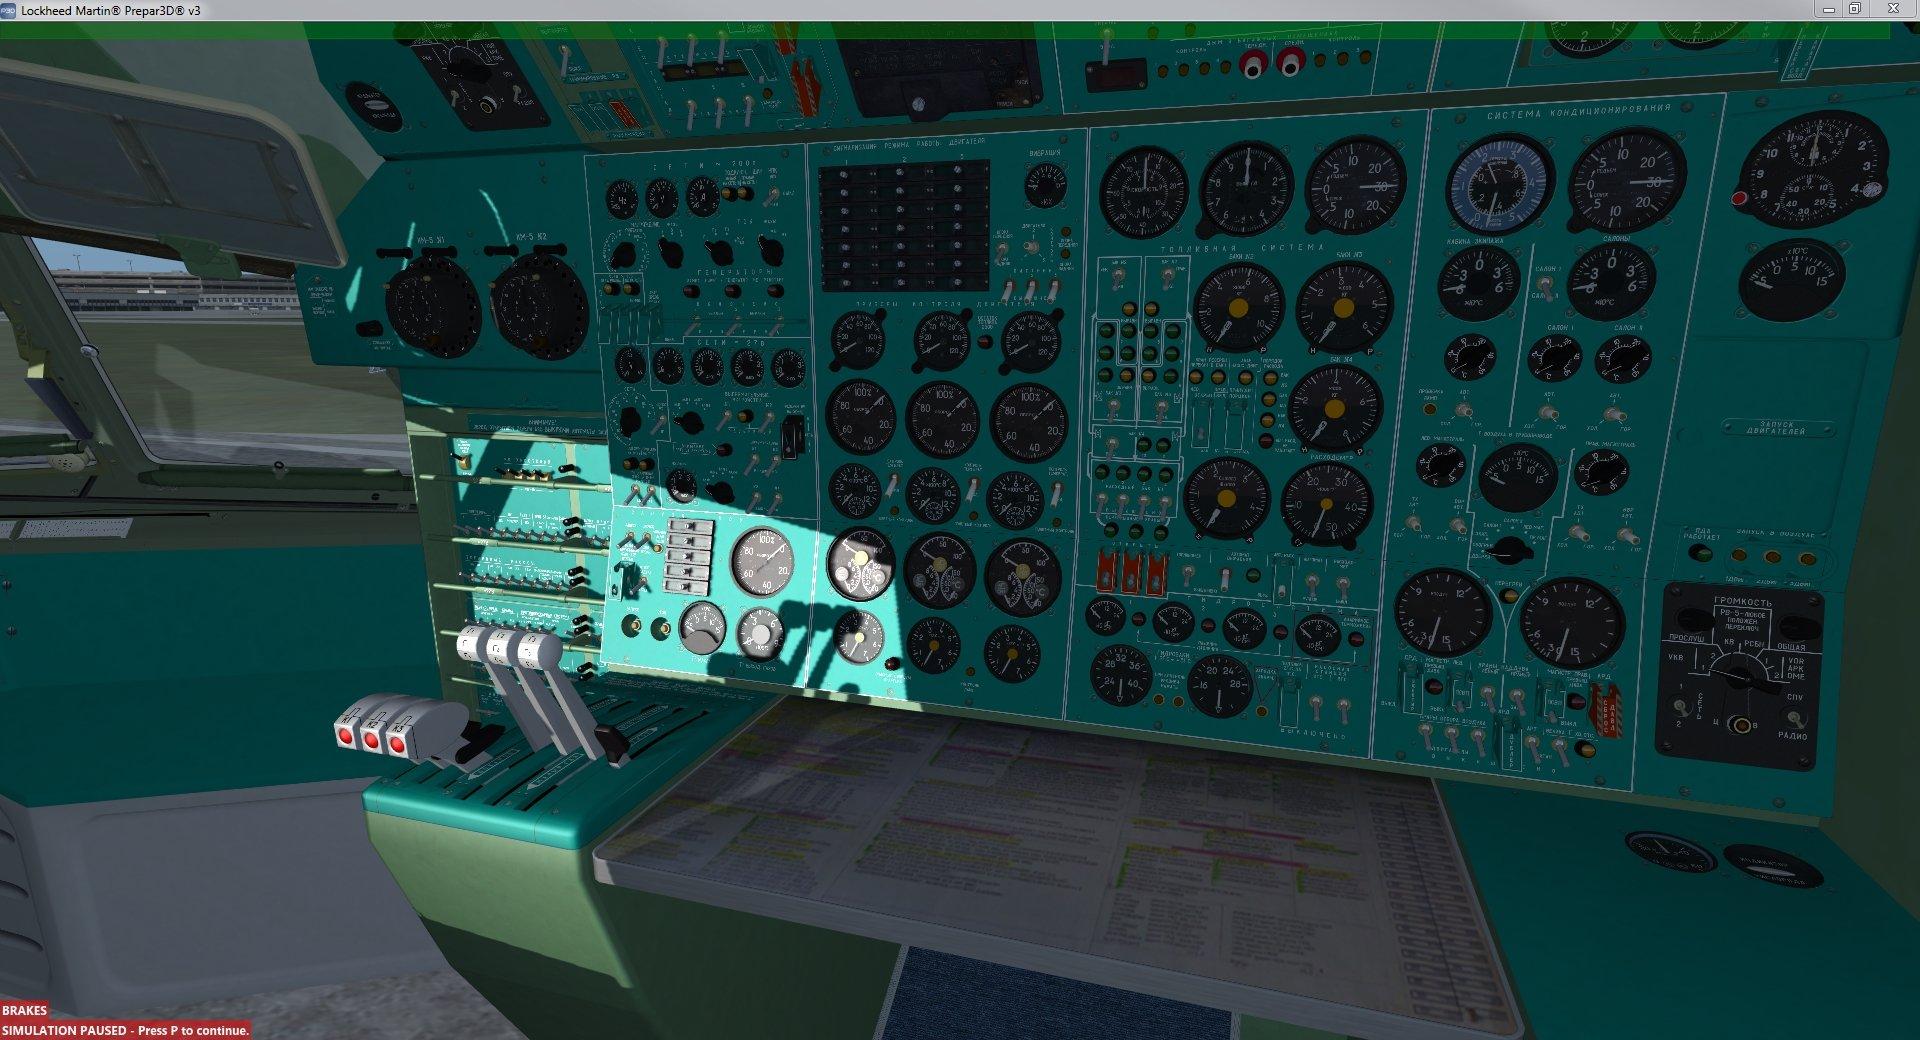 1234174838_2019-10-0311_51_13-LockheedMartinPrepar3Dv3.jpg.d40b7a924c06bbc0051c64831130dd74.jpg